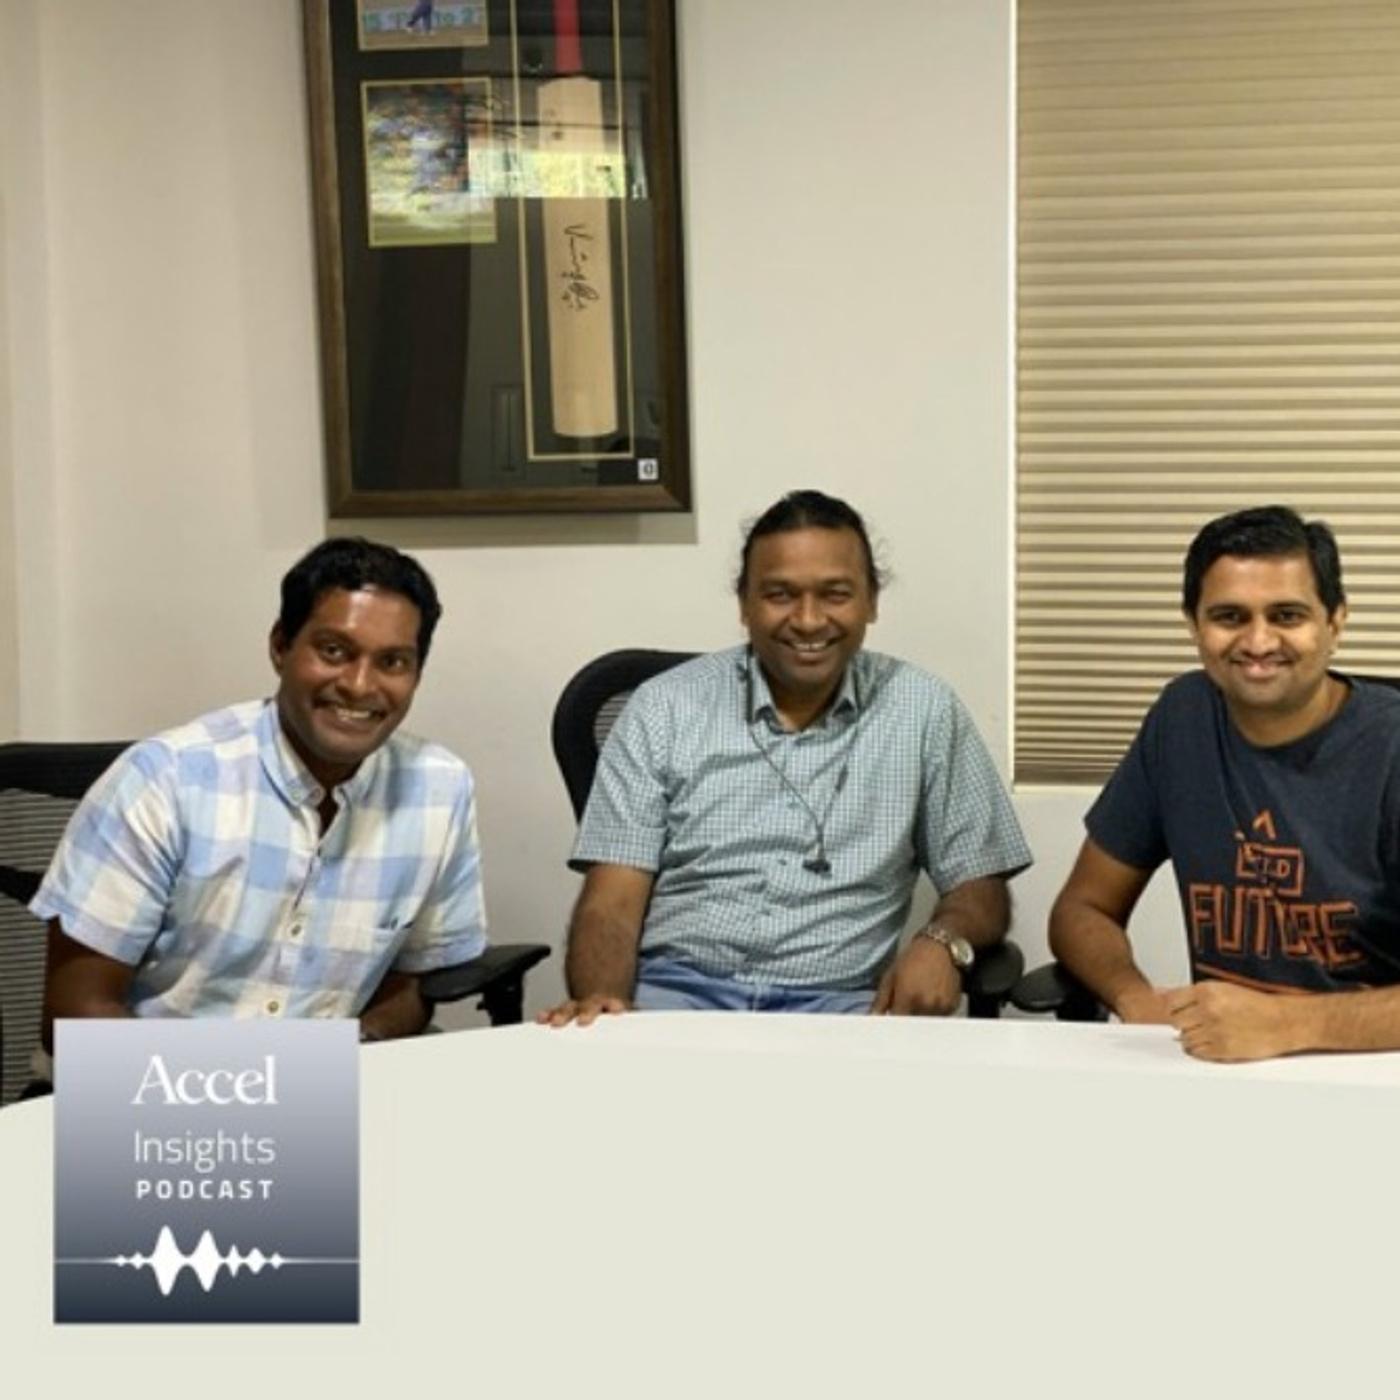 INSIGHTS#46 – Building SaaS business out of India for the global market: Shekhar Kirani & Krish Subramanian